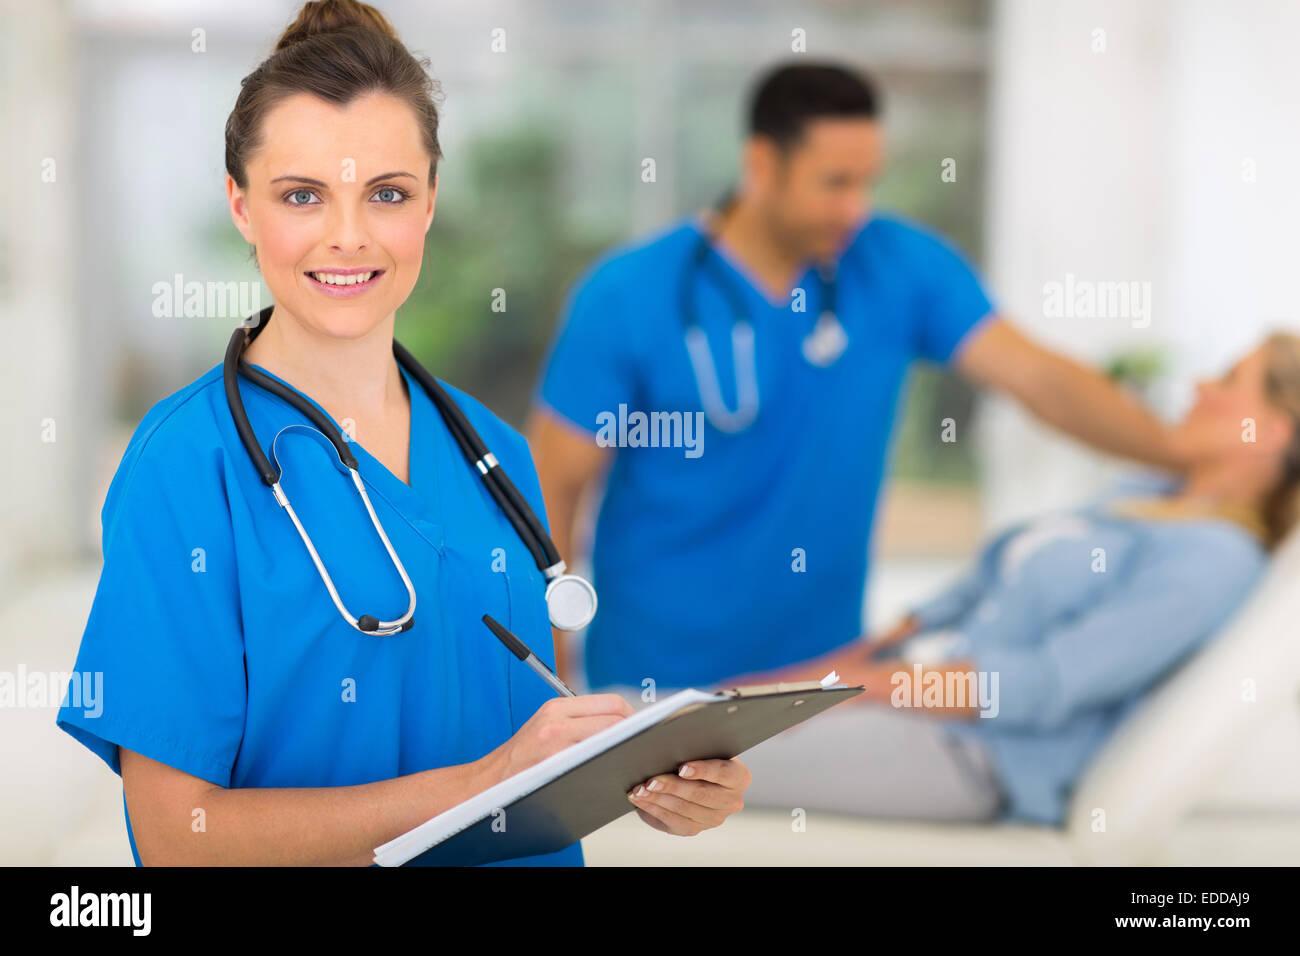 Retrato de hermosa enfermera celebración portapapeles Imagen De Stock